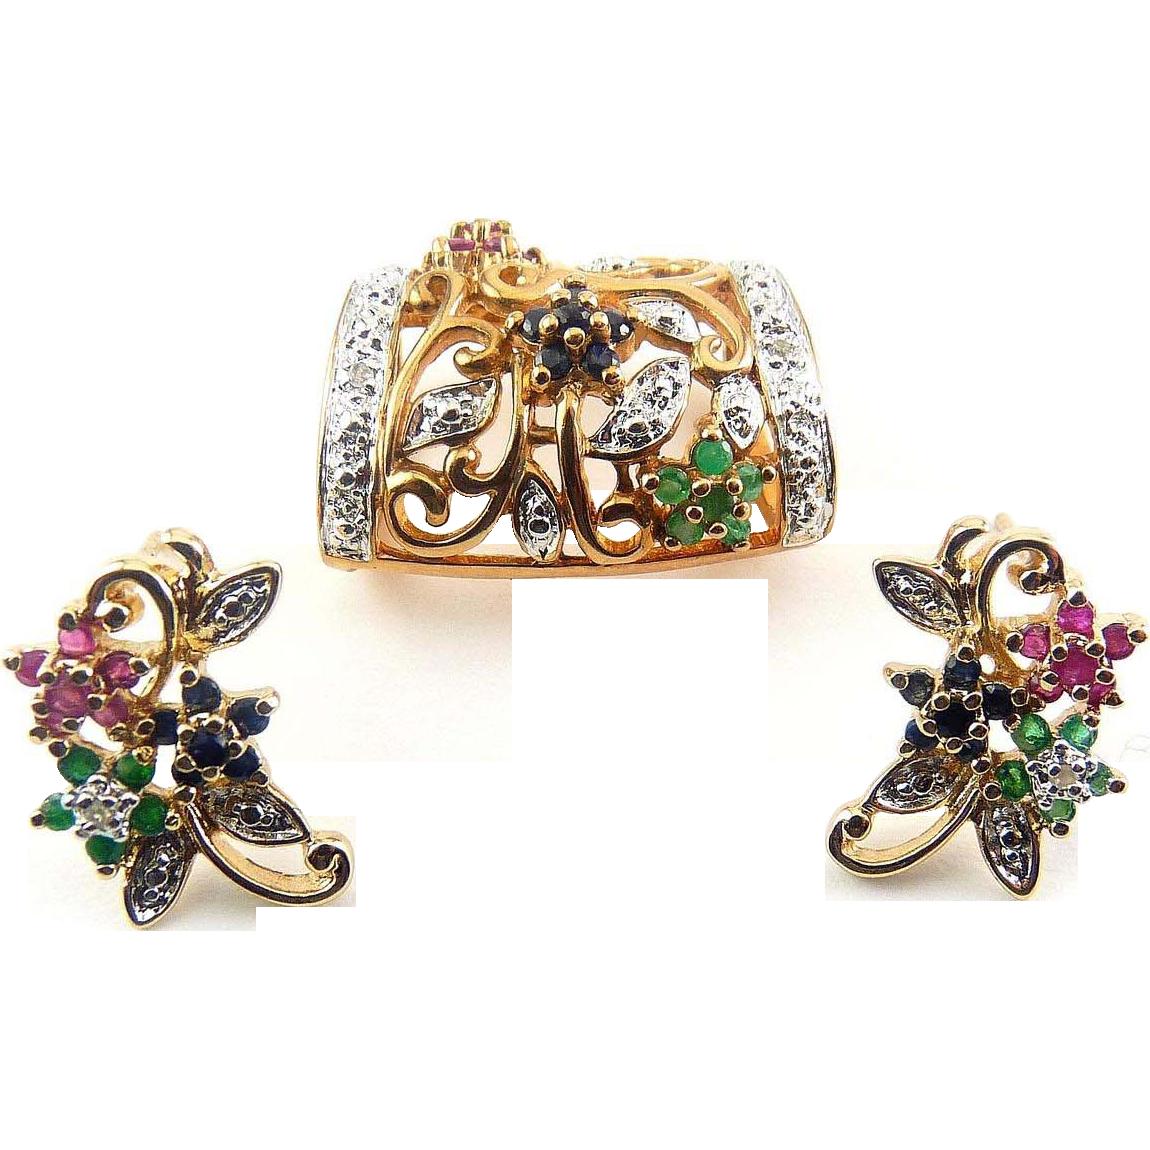 Sterling Silver & Gold Vermeil Gem Earrings & Enhancer Pendant - Rubies, Sapphires, Emeralds